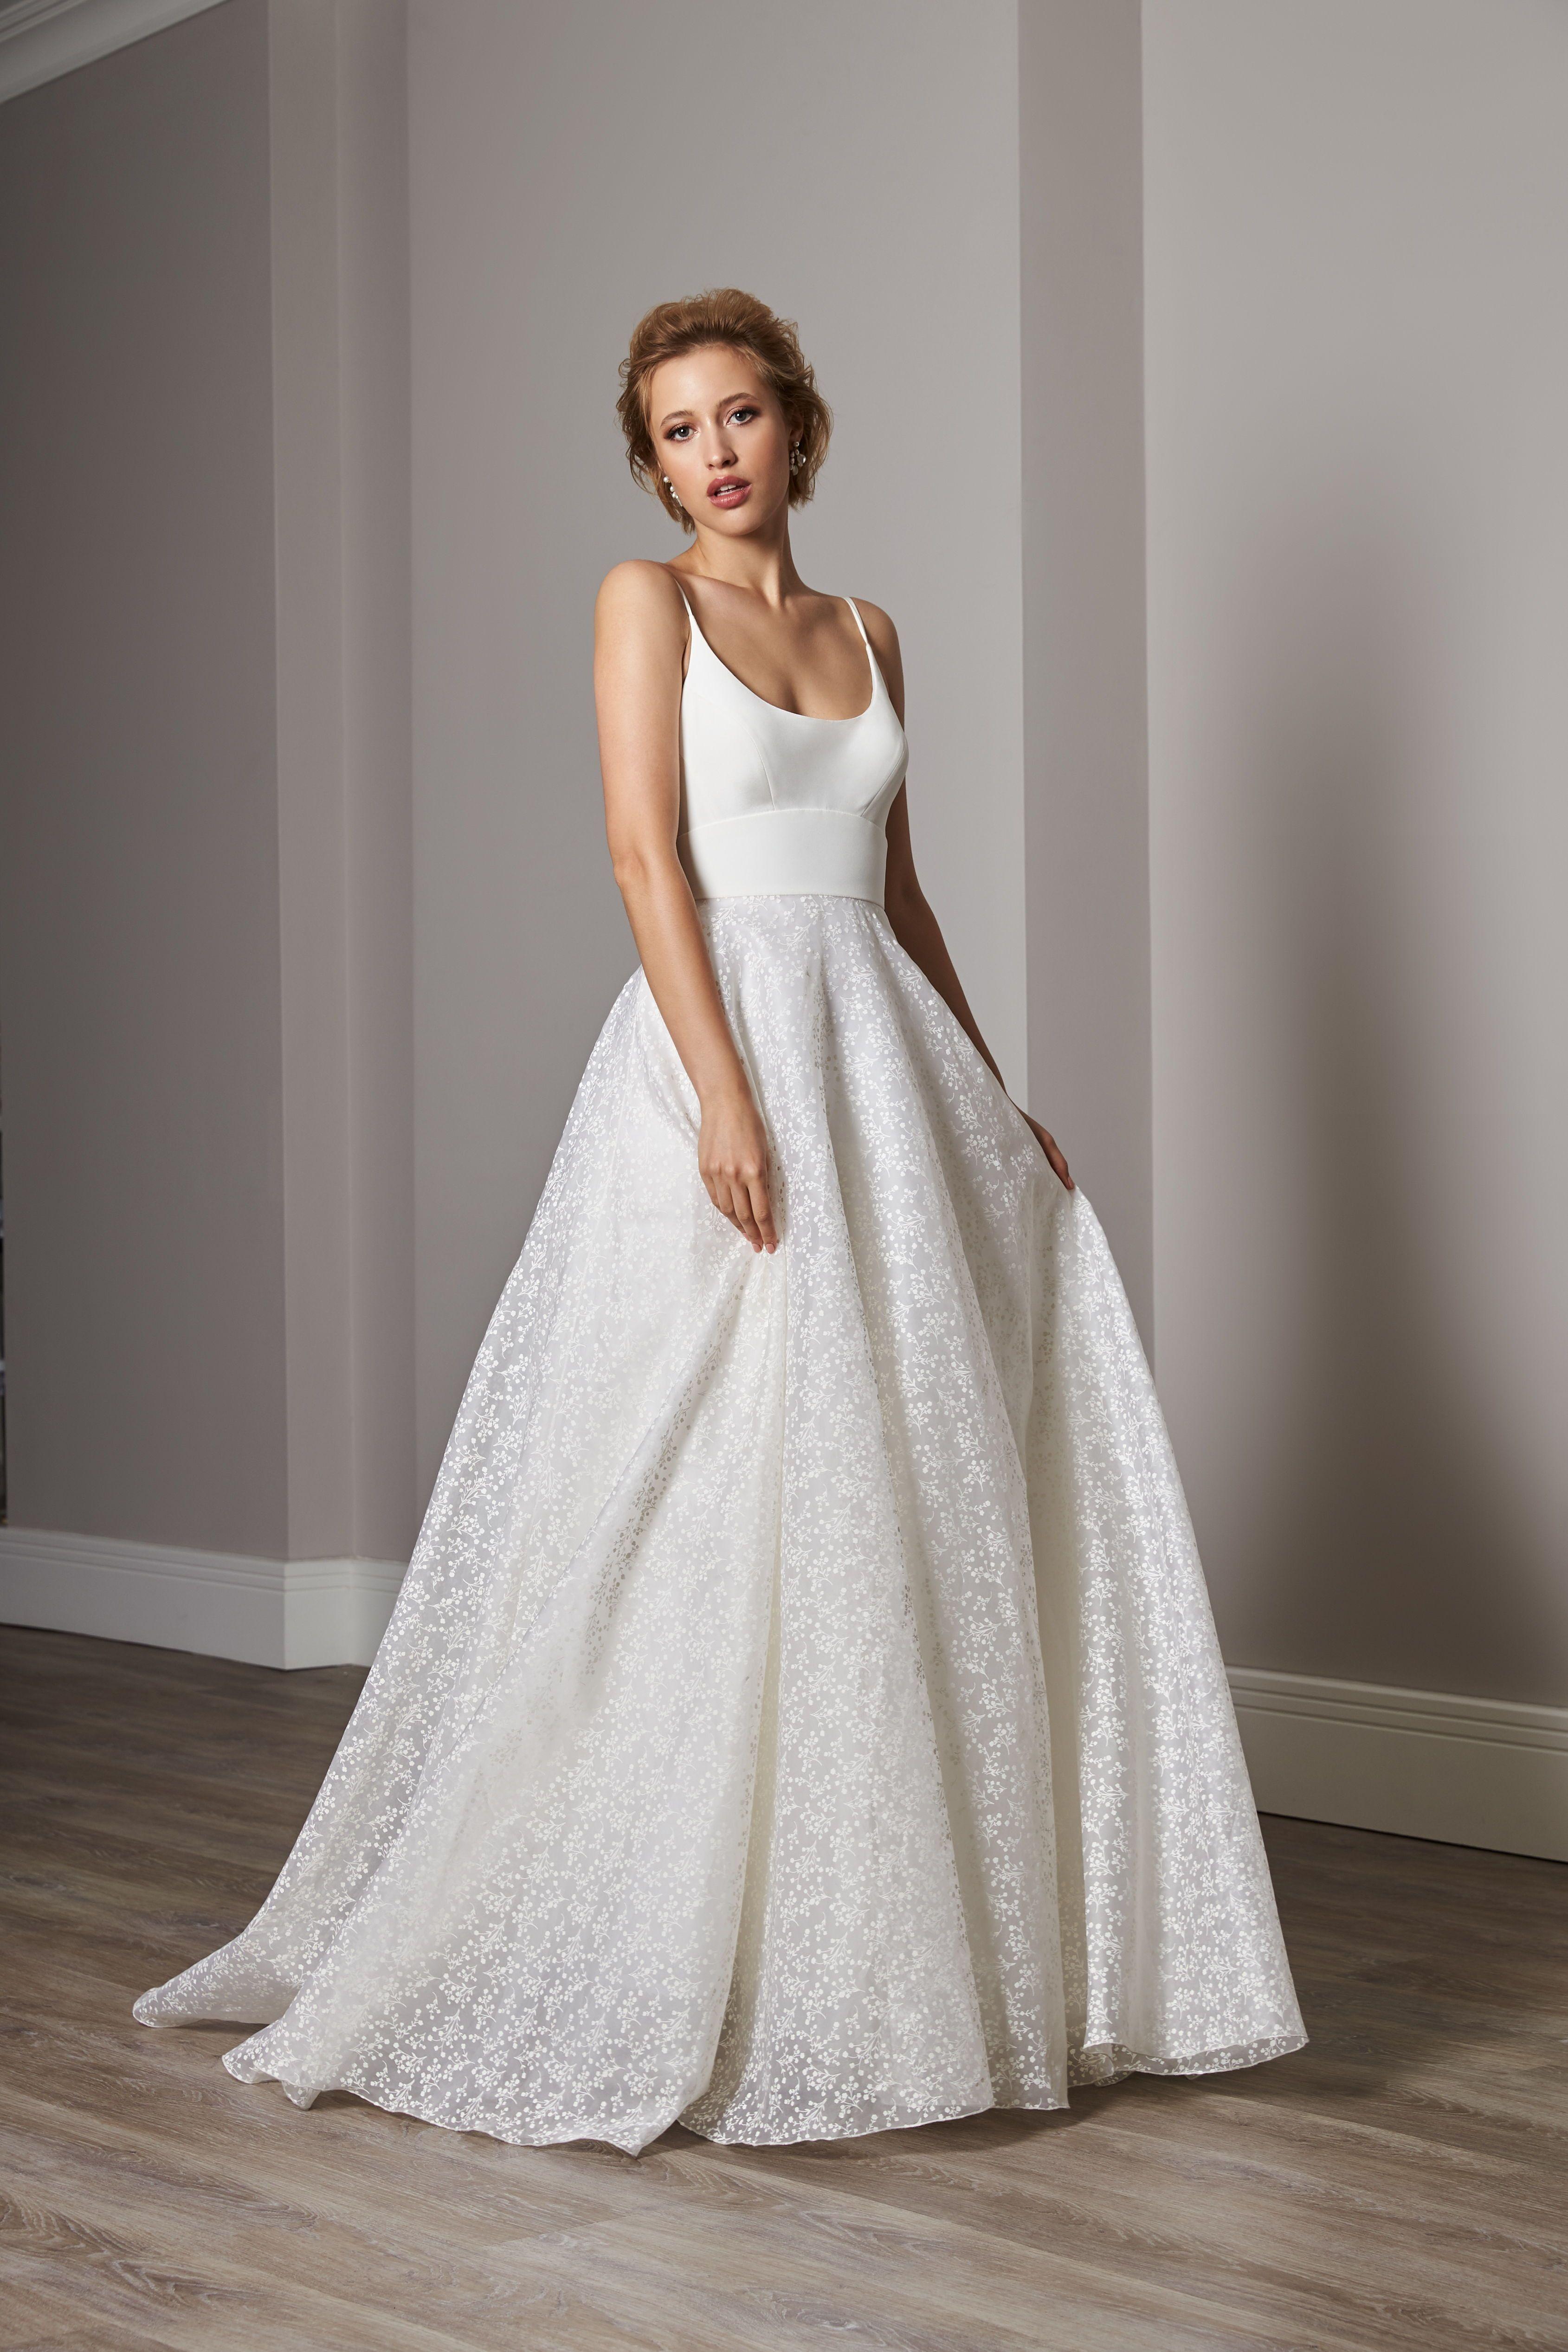 Ottilie Sassi Holford Wedding dress available at Carina